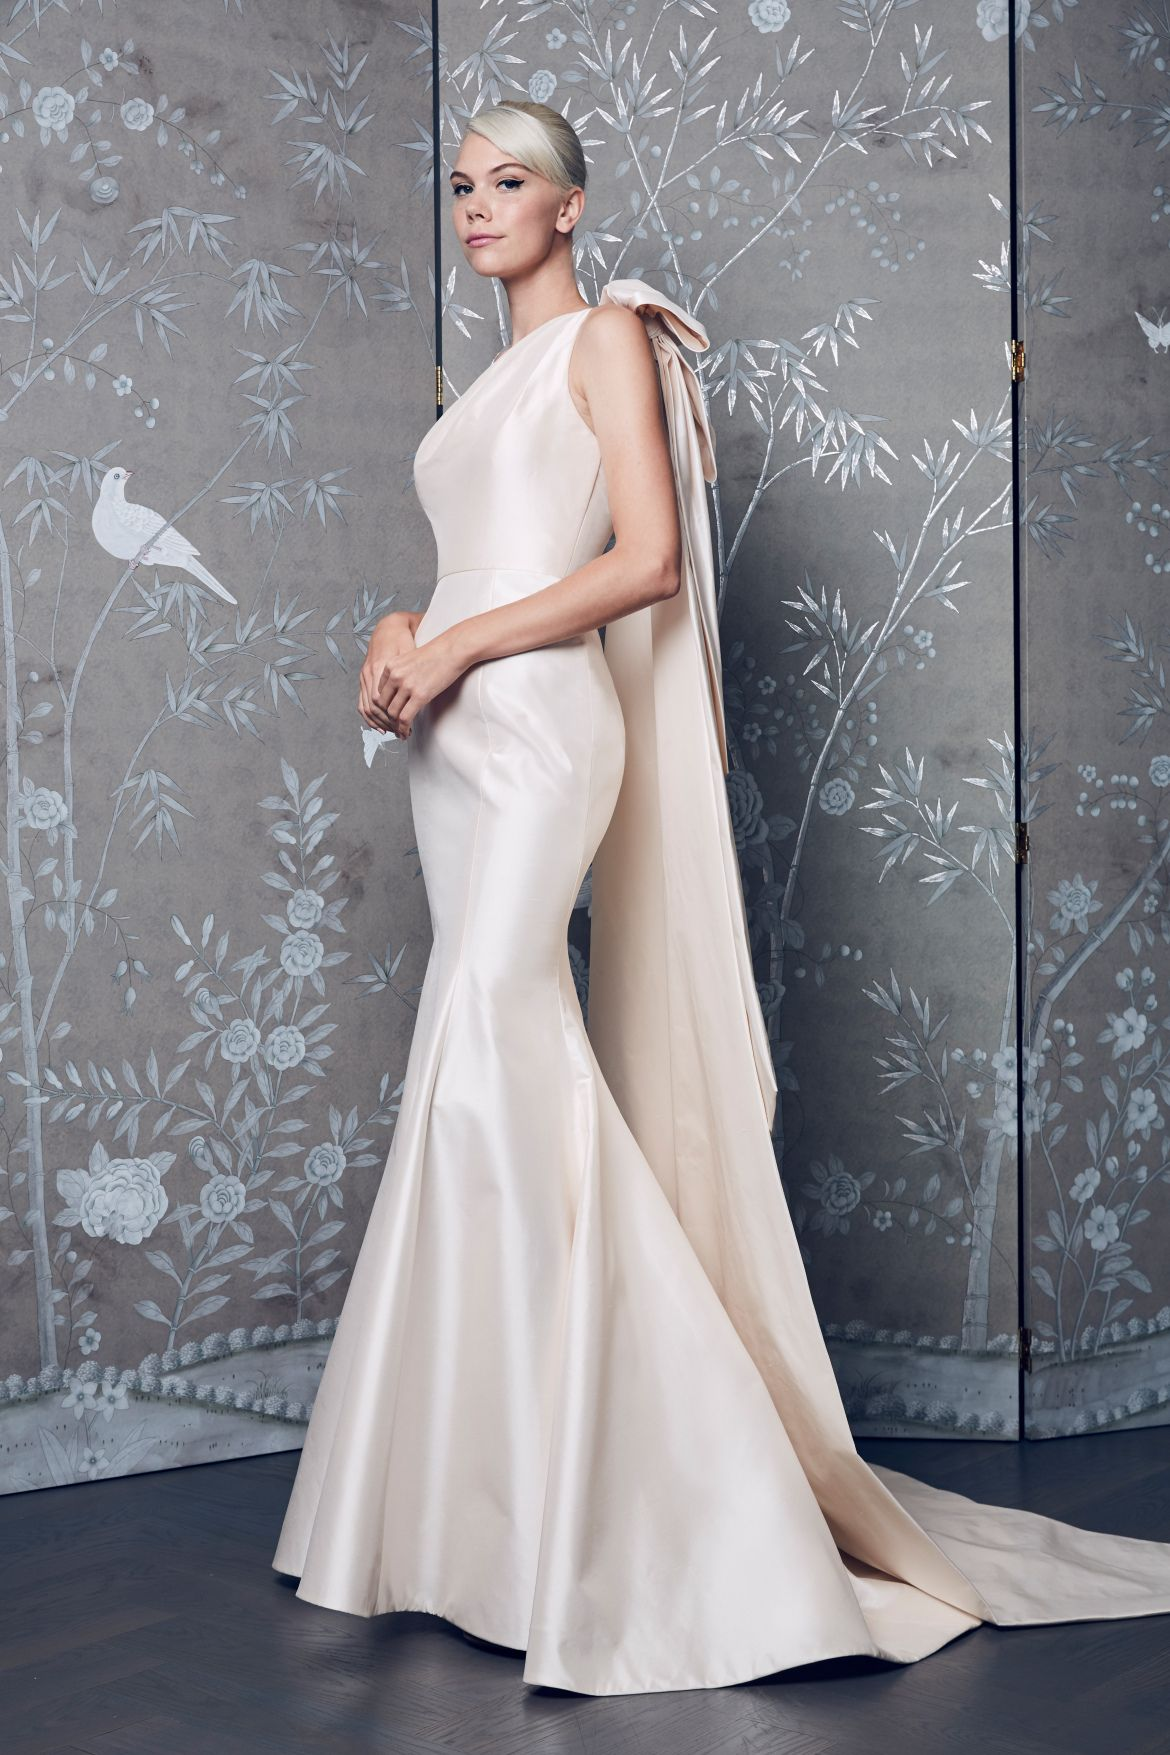 99+ One Strap Wedding Dresses - Dressy Dresses for Weddings Check ...